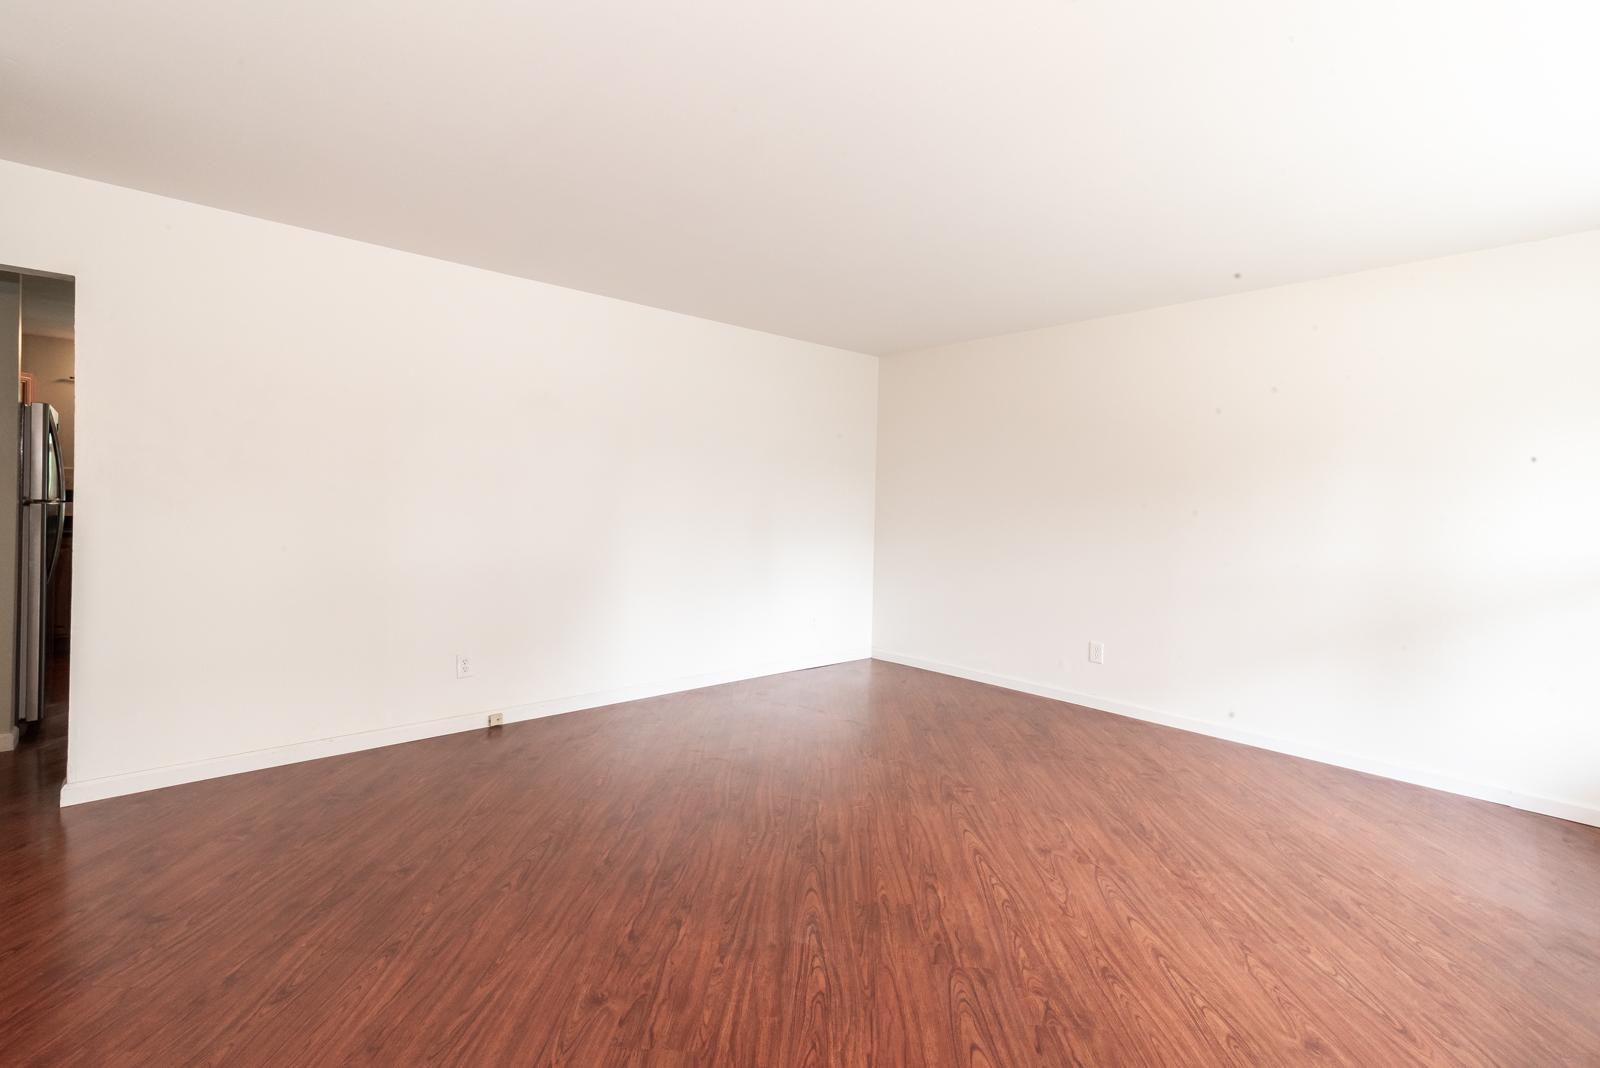 St Charles Living Room Before